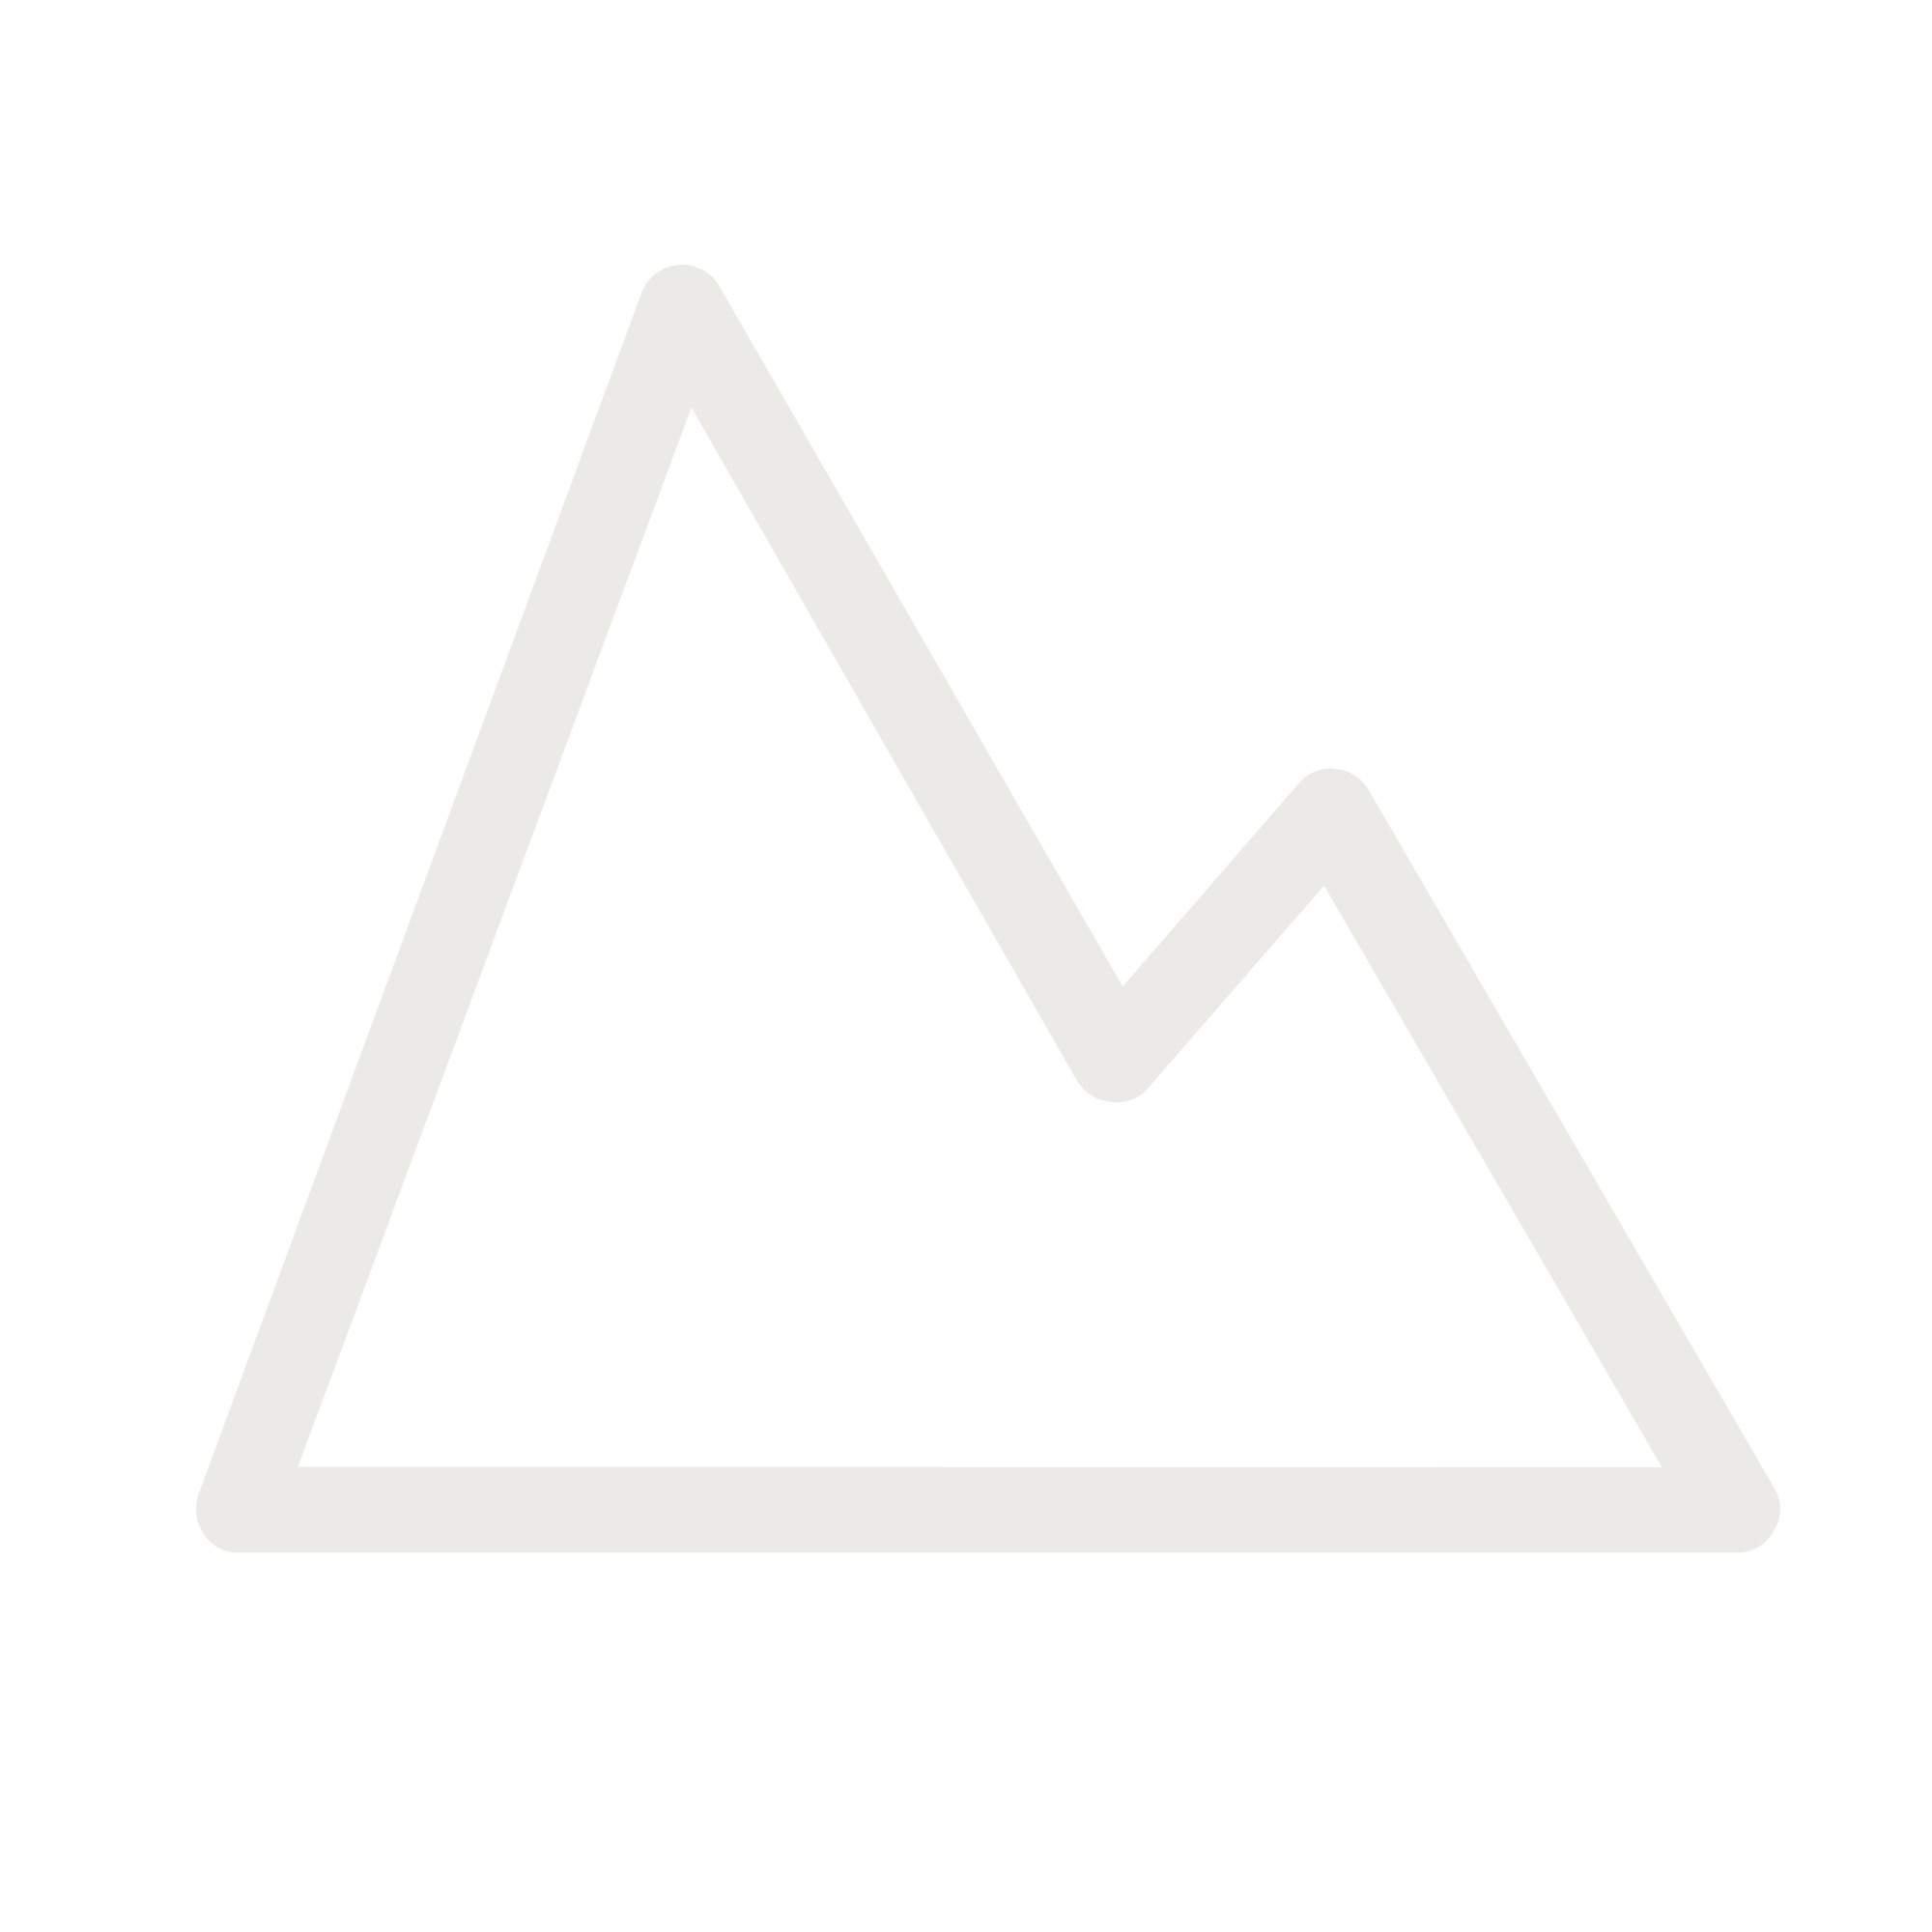 Lowa Renegade Gtx Mid Damen Gr. 10 - beige-sand|grau / stein - Klassische Lederhikingstiefel 320945 0925